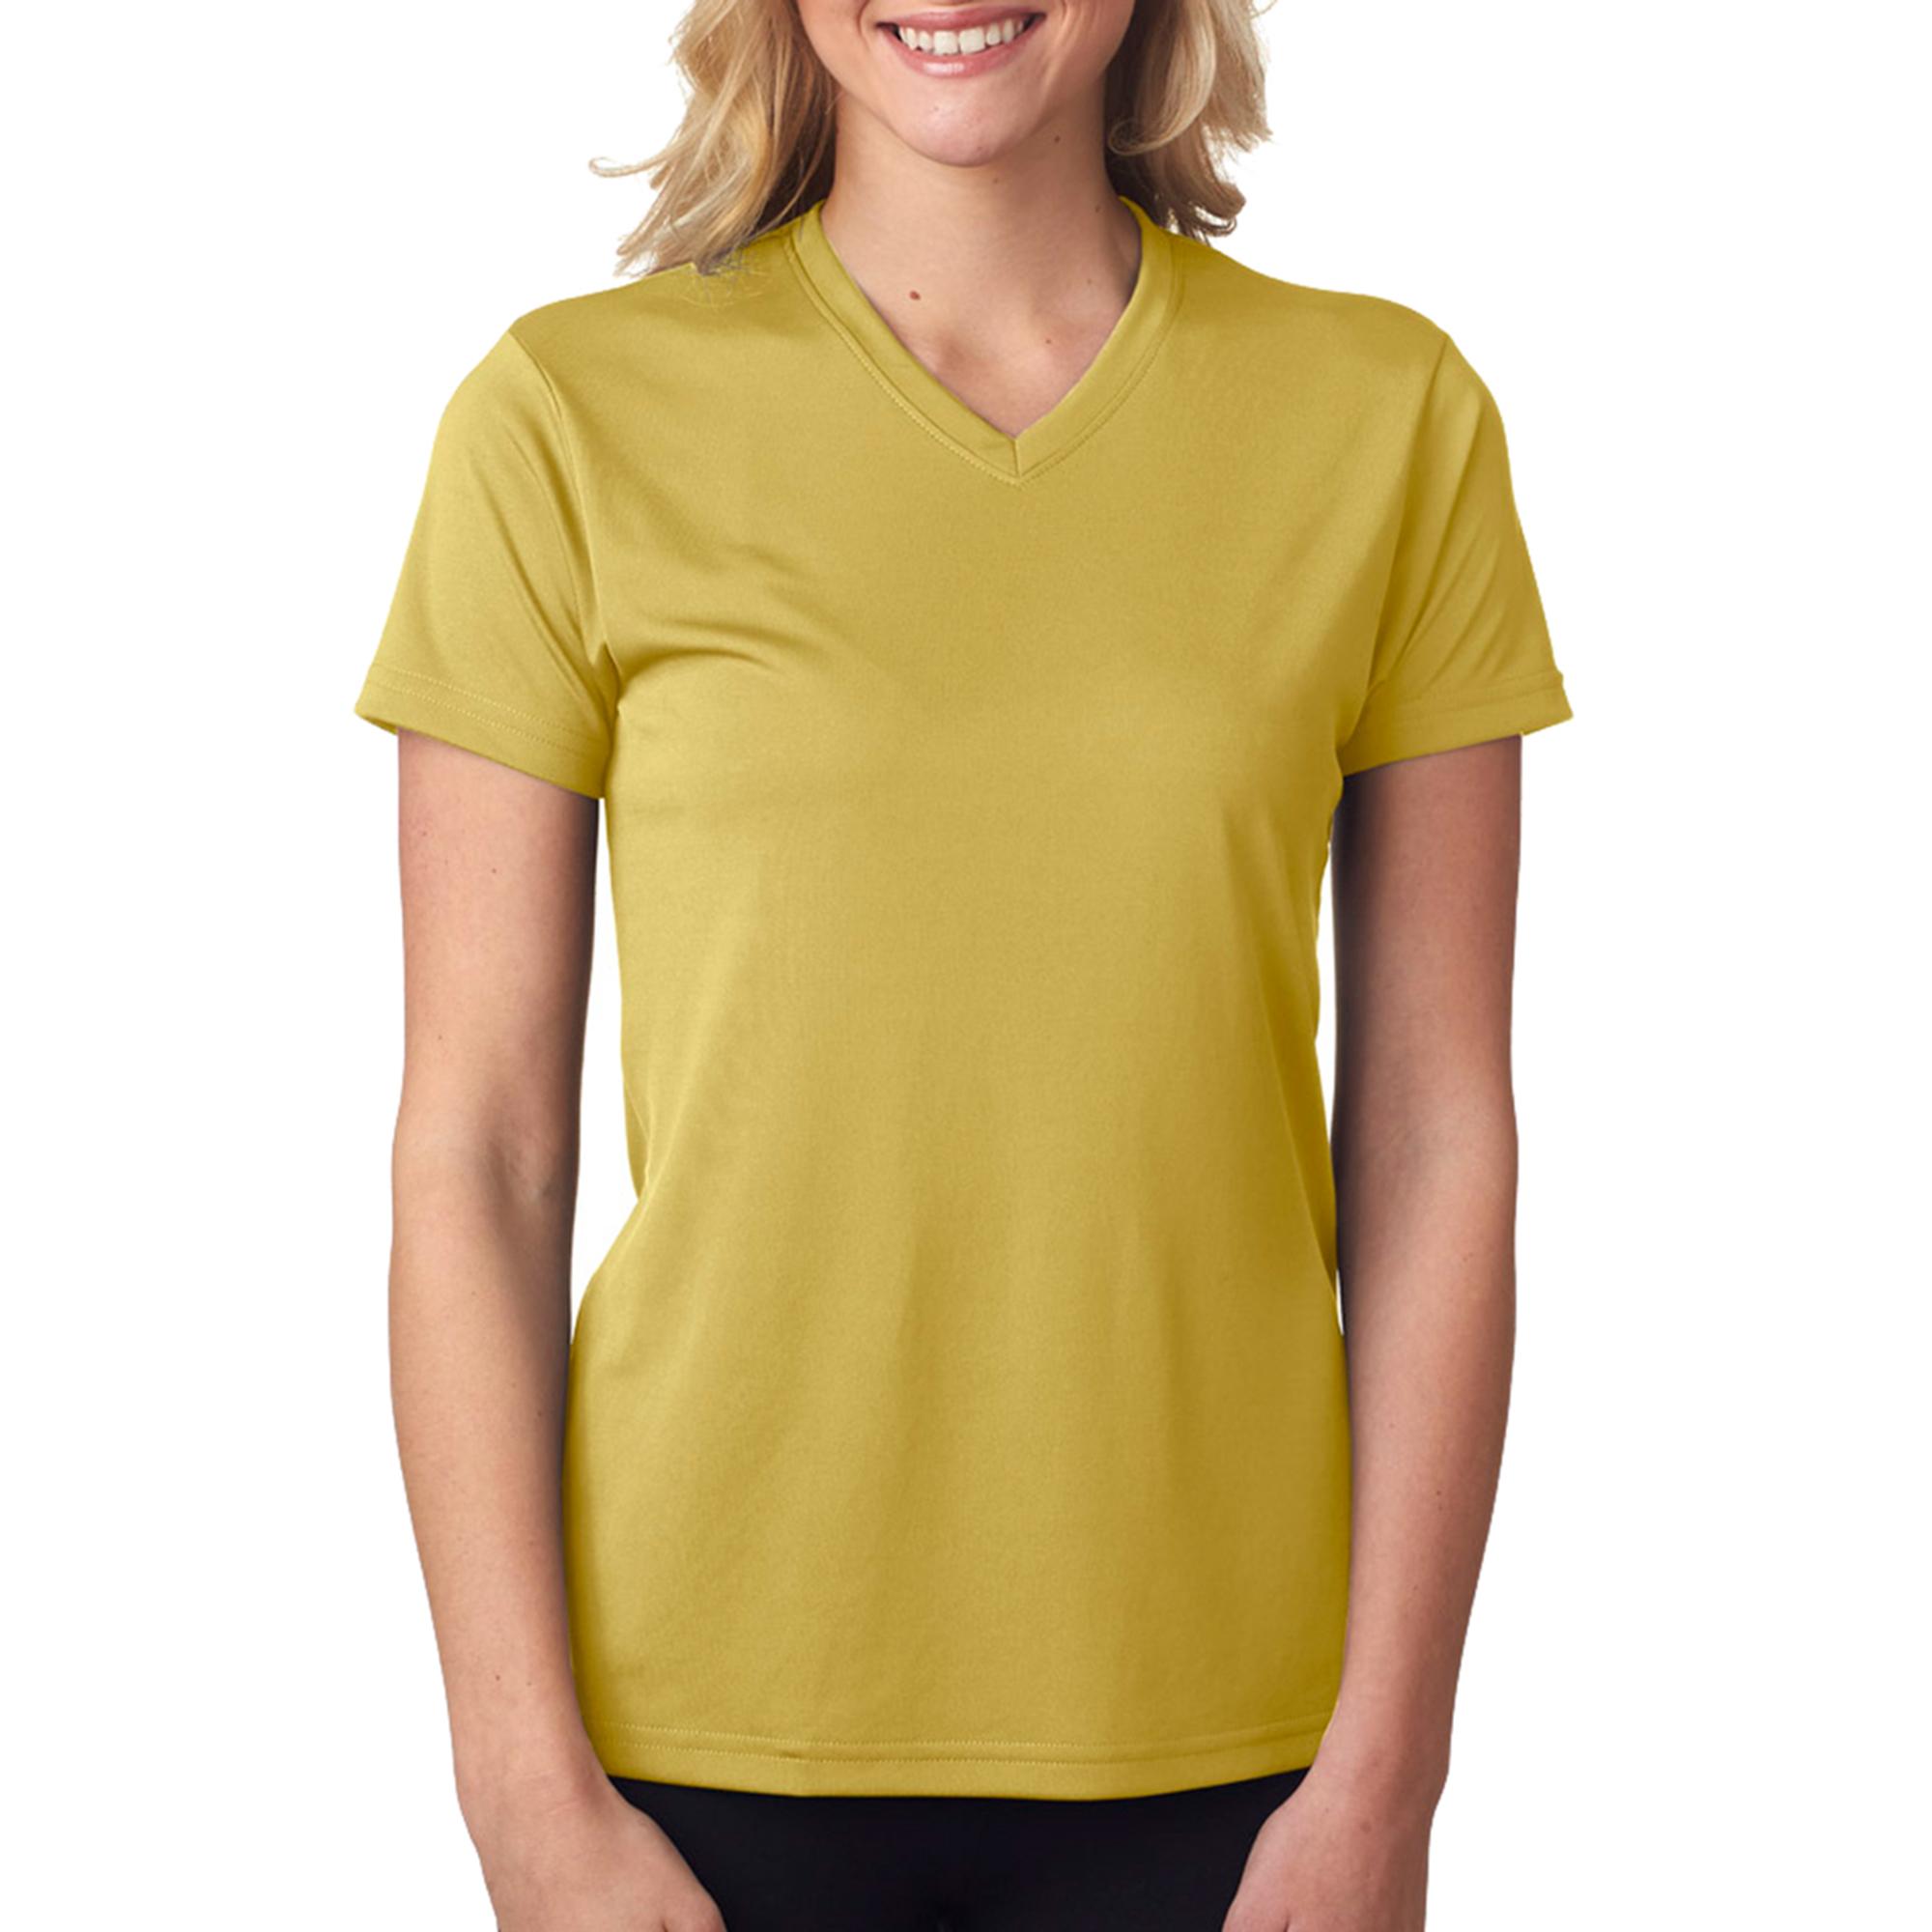 A4 NW3234 Women's Odor Resistant Performance Marathon T-Shirt at Sears.com